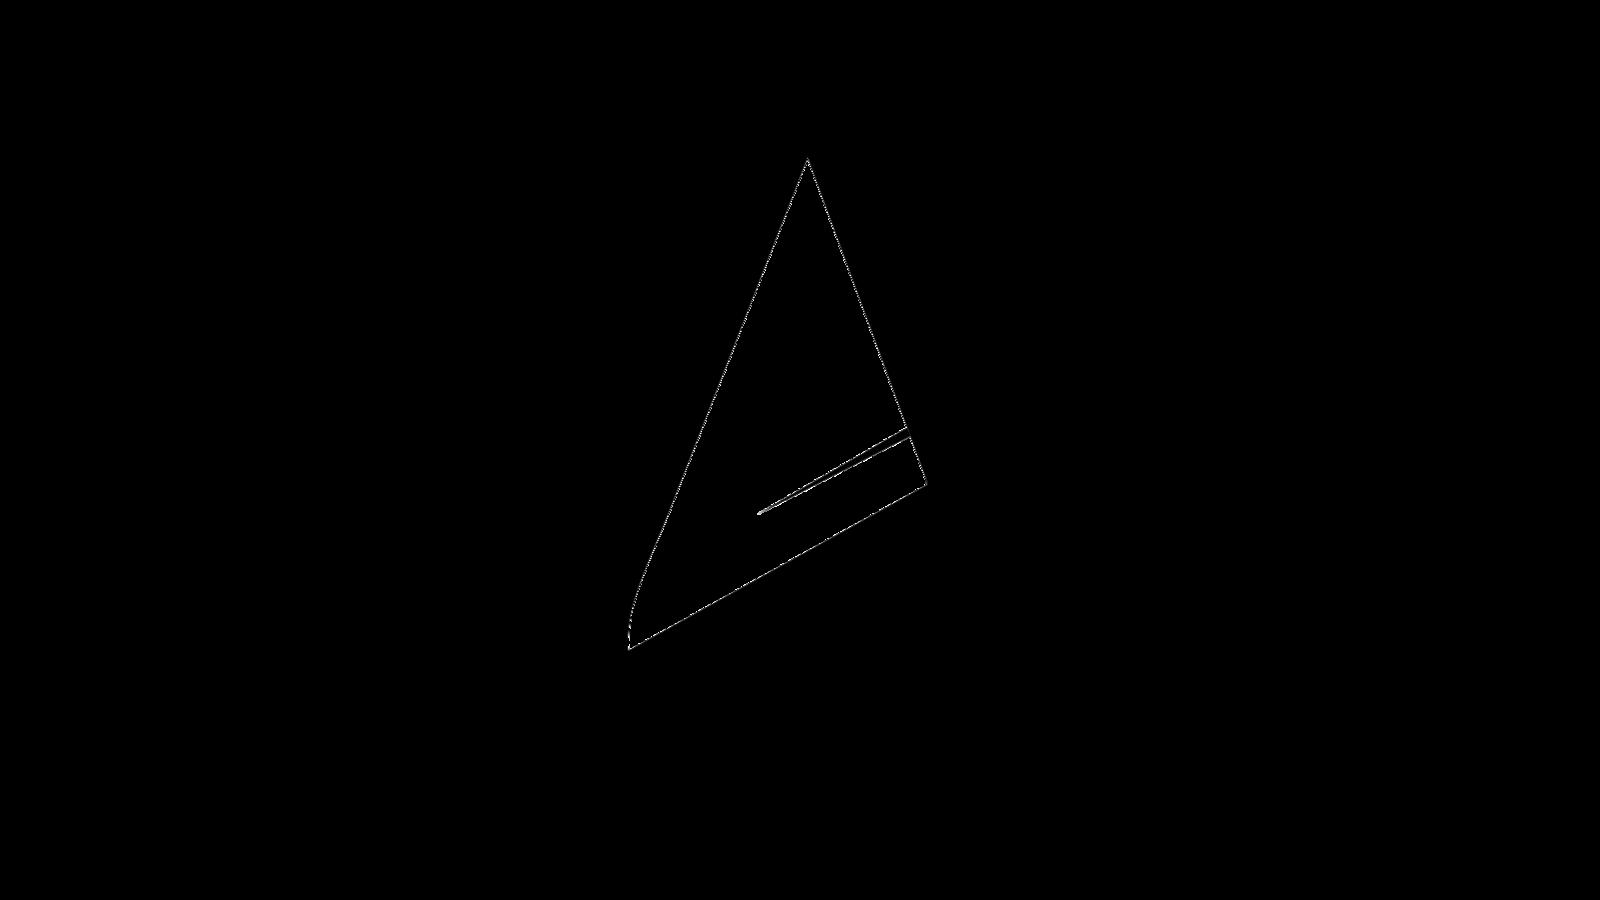 Assassins Creed Transparent PNG Images, Assassins Creed Logo.